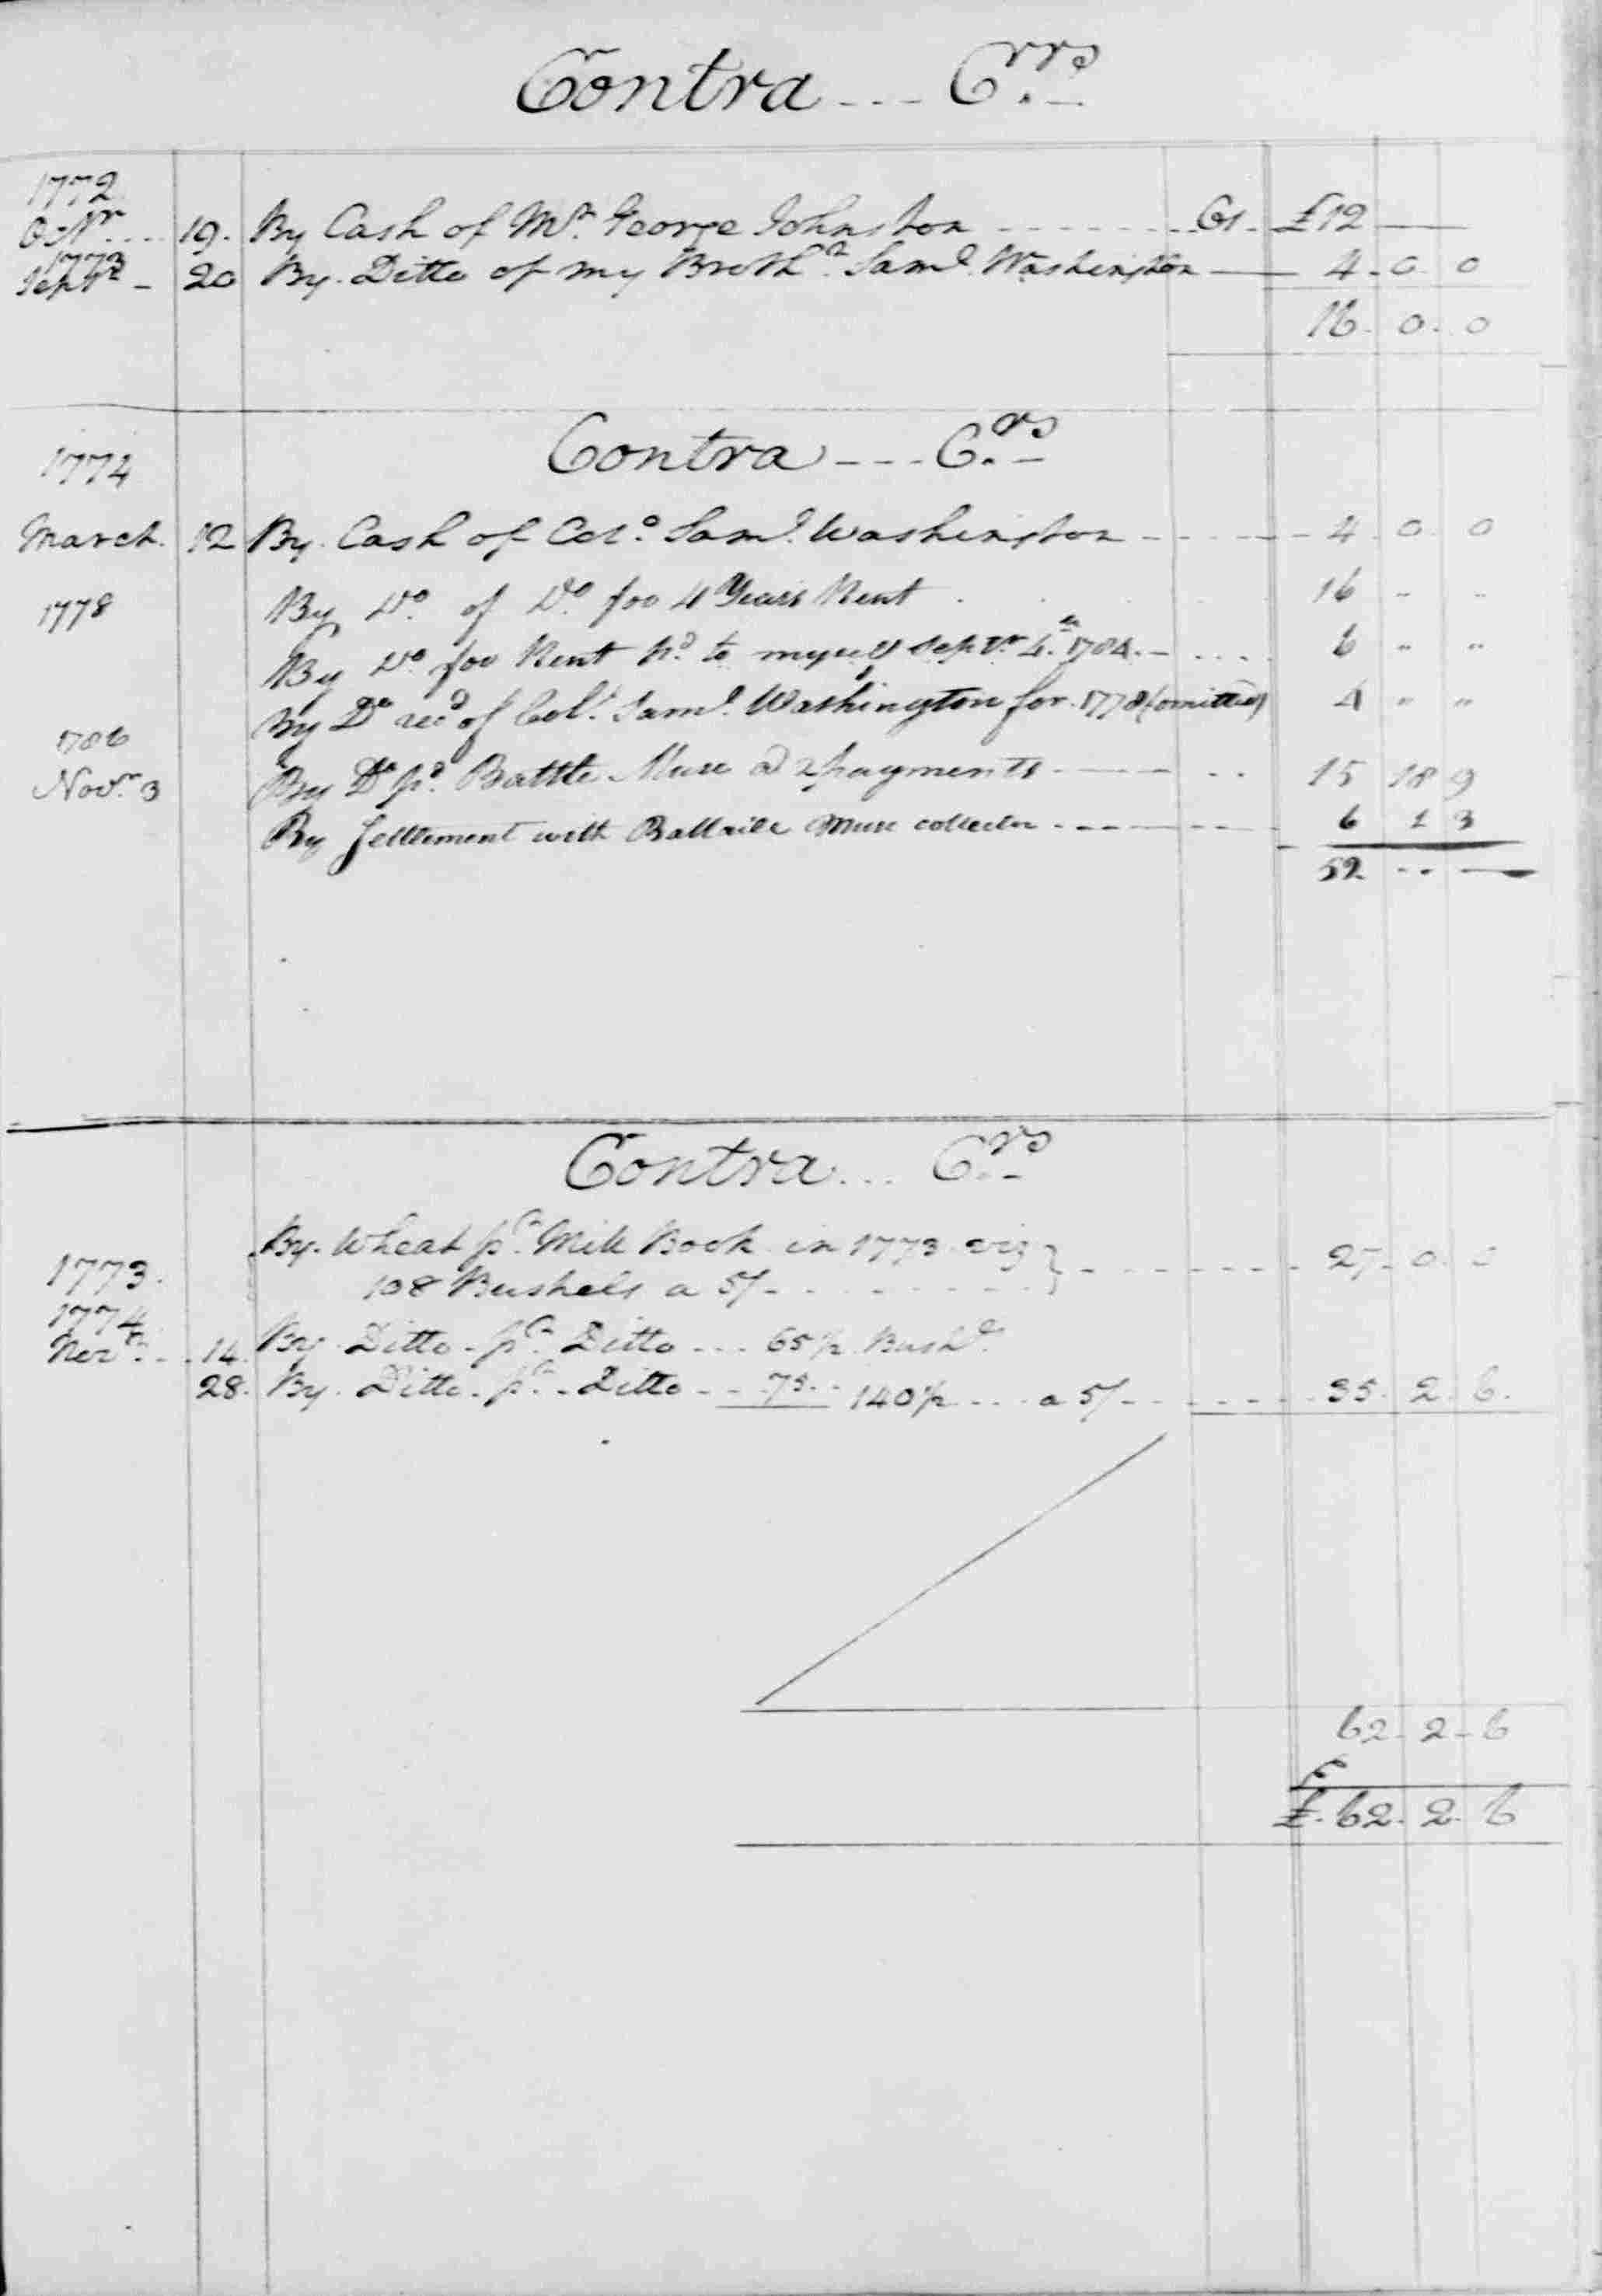 Ledger B, folio 32, right side